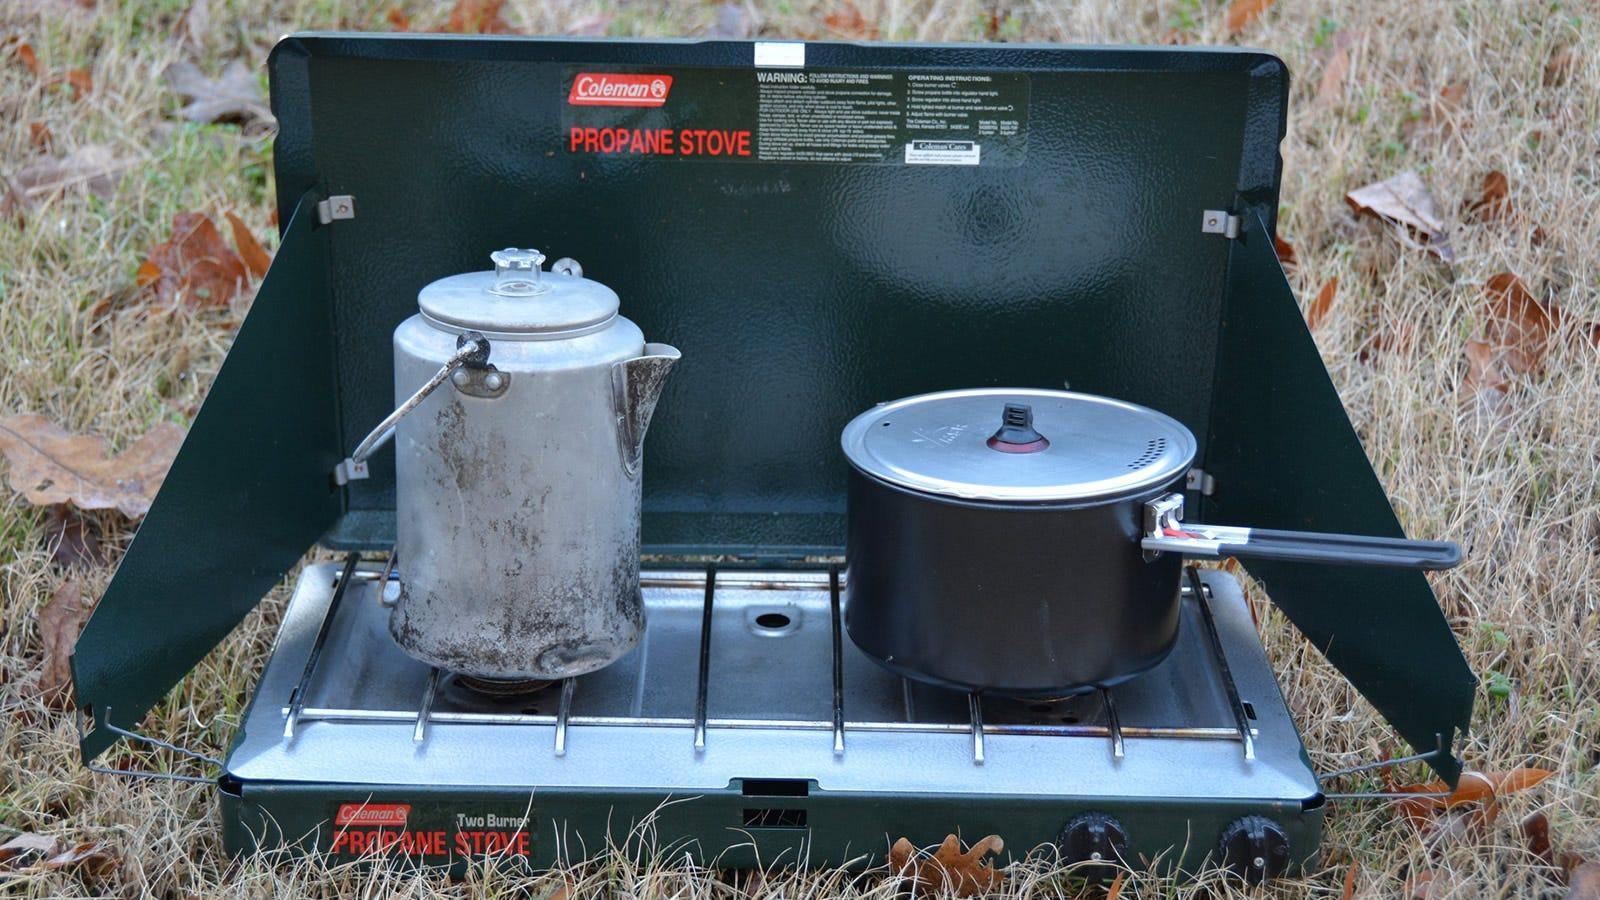 Coleman Classic camp stove